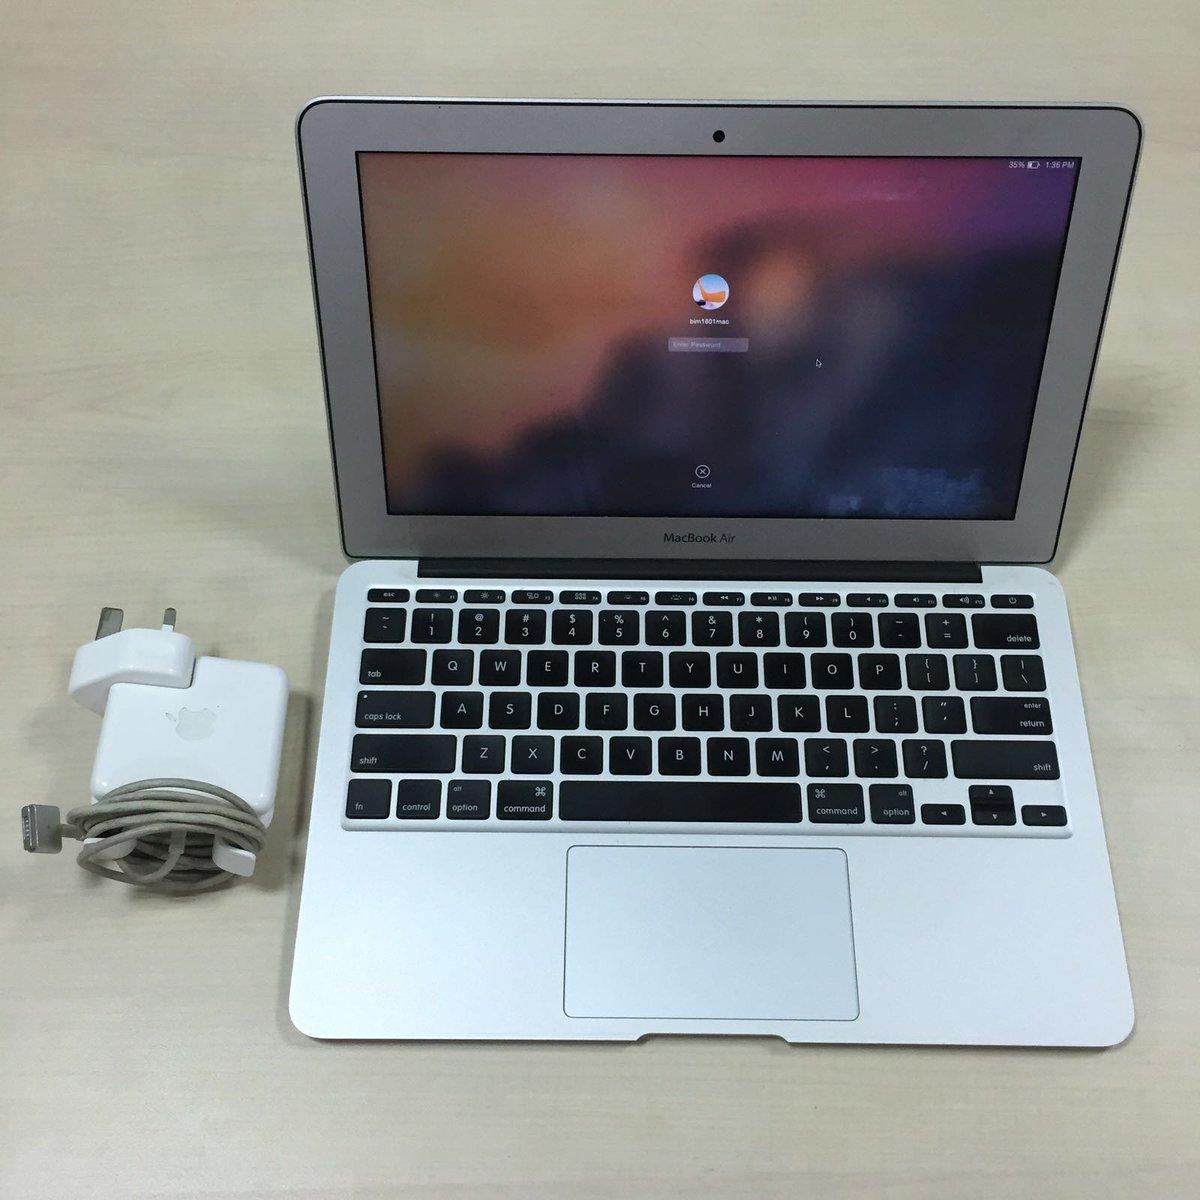 Bim1601 On Twitter Wts 2nd Macbook Air Md224 Mid 2012 11 Ssd 128gb Ram 4g Bandung Jubelapple Macbookair Jubelapple Https T Co V9mysa0dhn